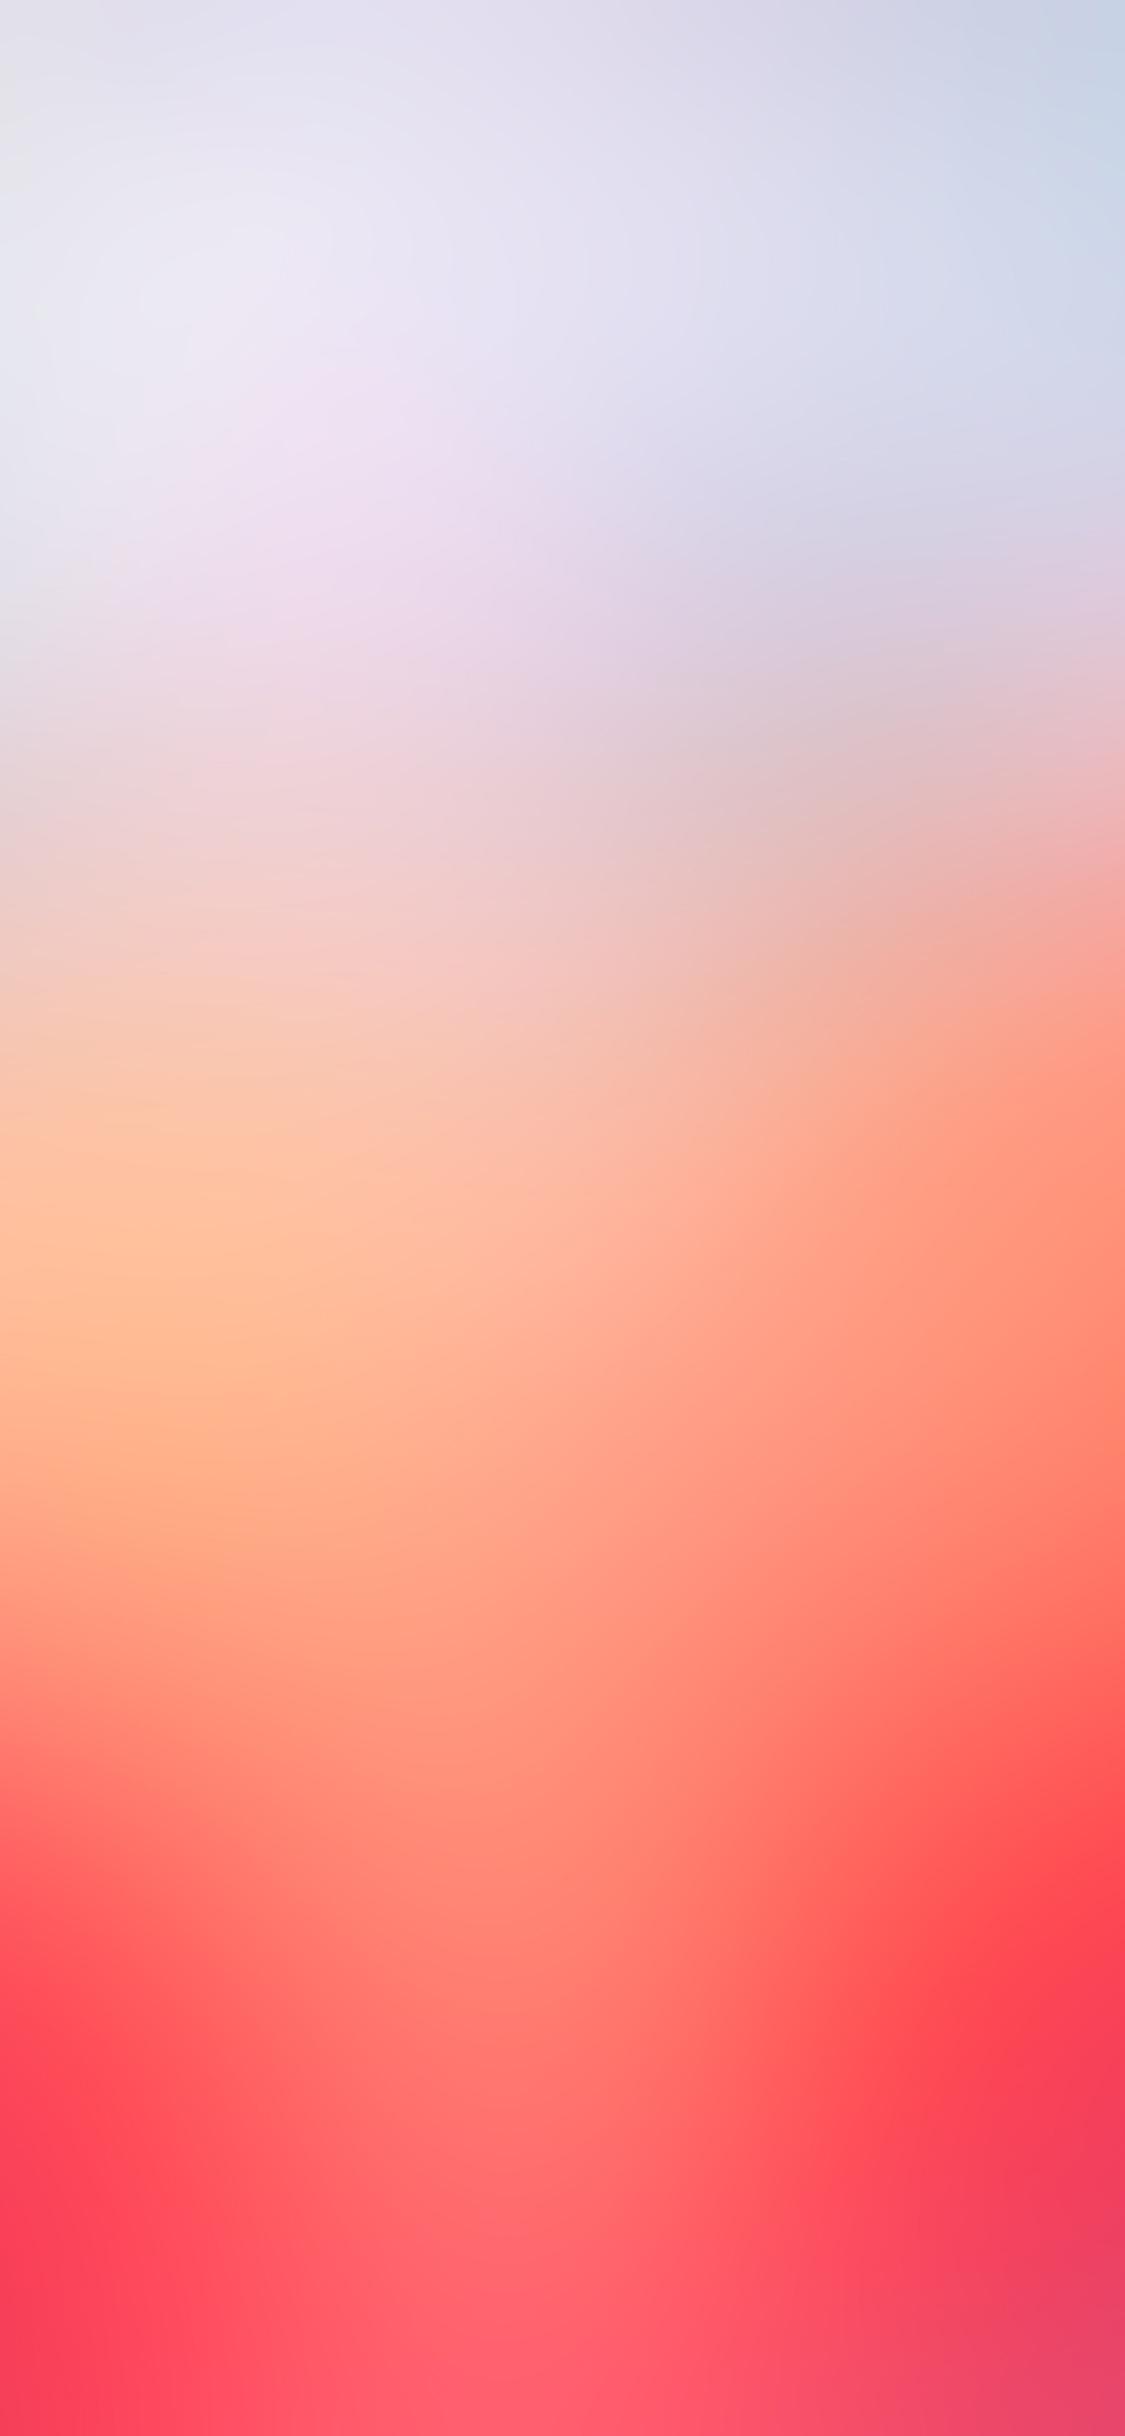 iPhoneXpapers.com-Apple-iPhone-wallpaper-sh74-pink-love-cute-gradation-blur